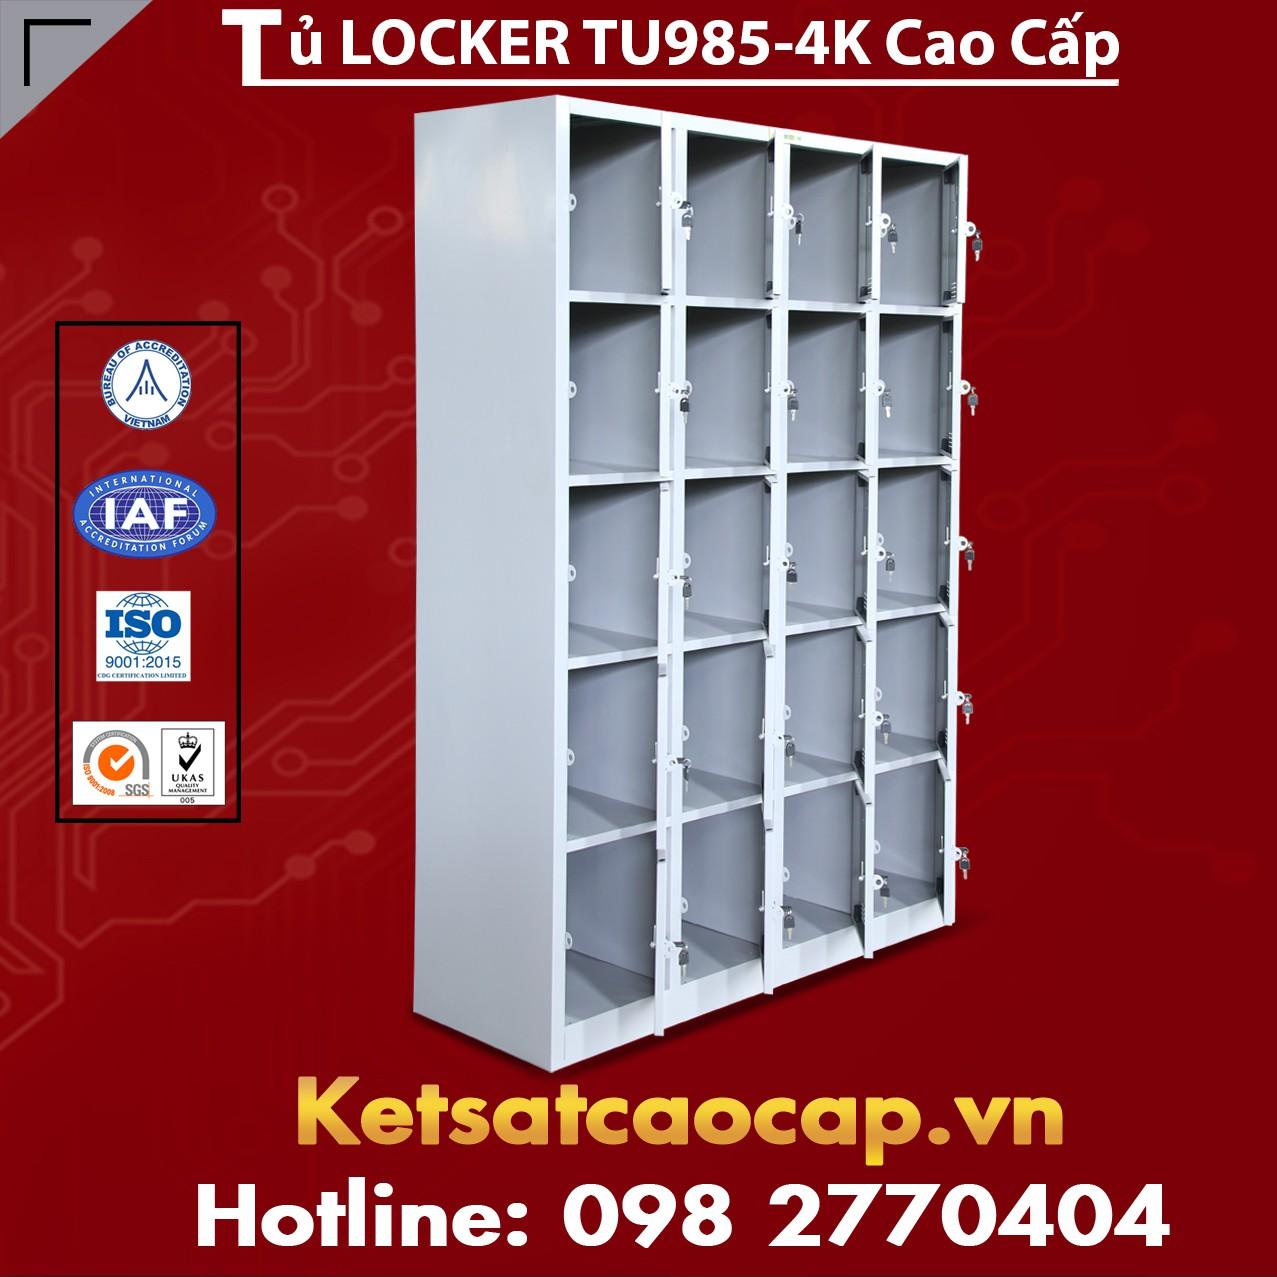 Tủ Locker TU985-4K Cao Cấp